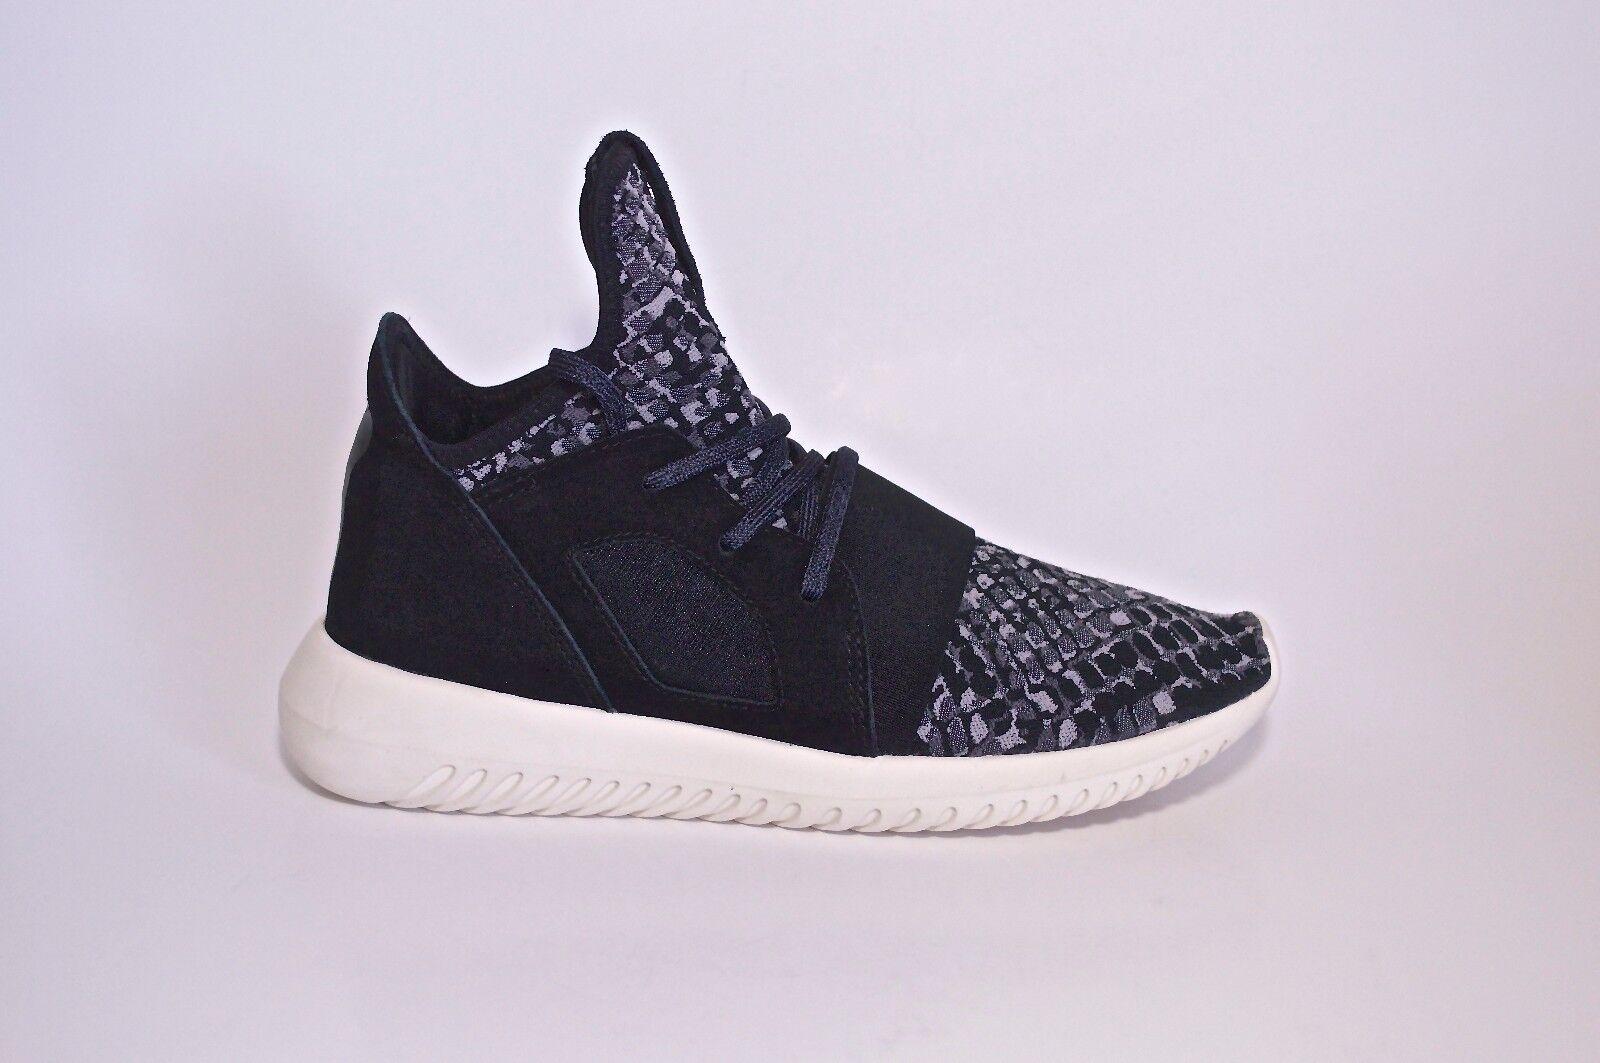 Adidas Originals Tubular Defiant Black Shoes Women's Size 7.5 US BB5122